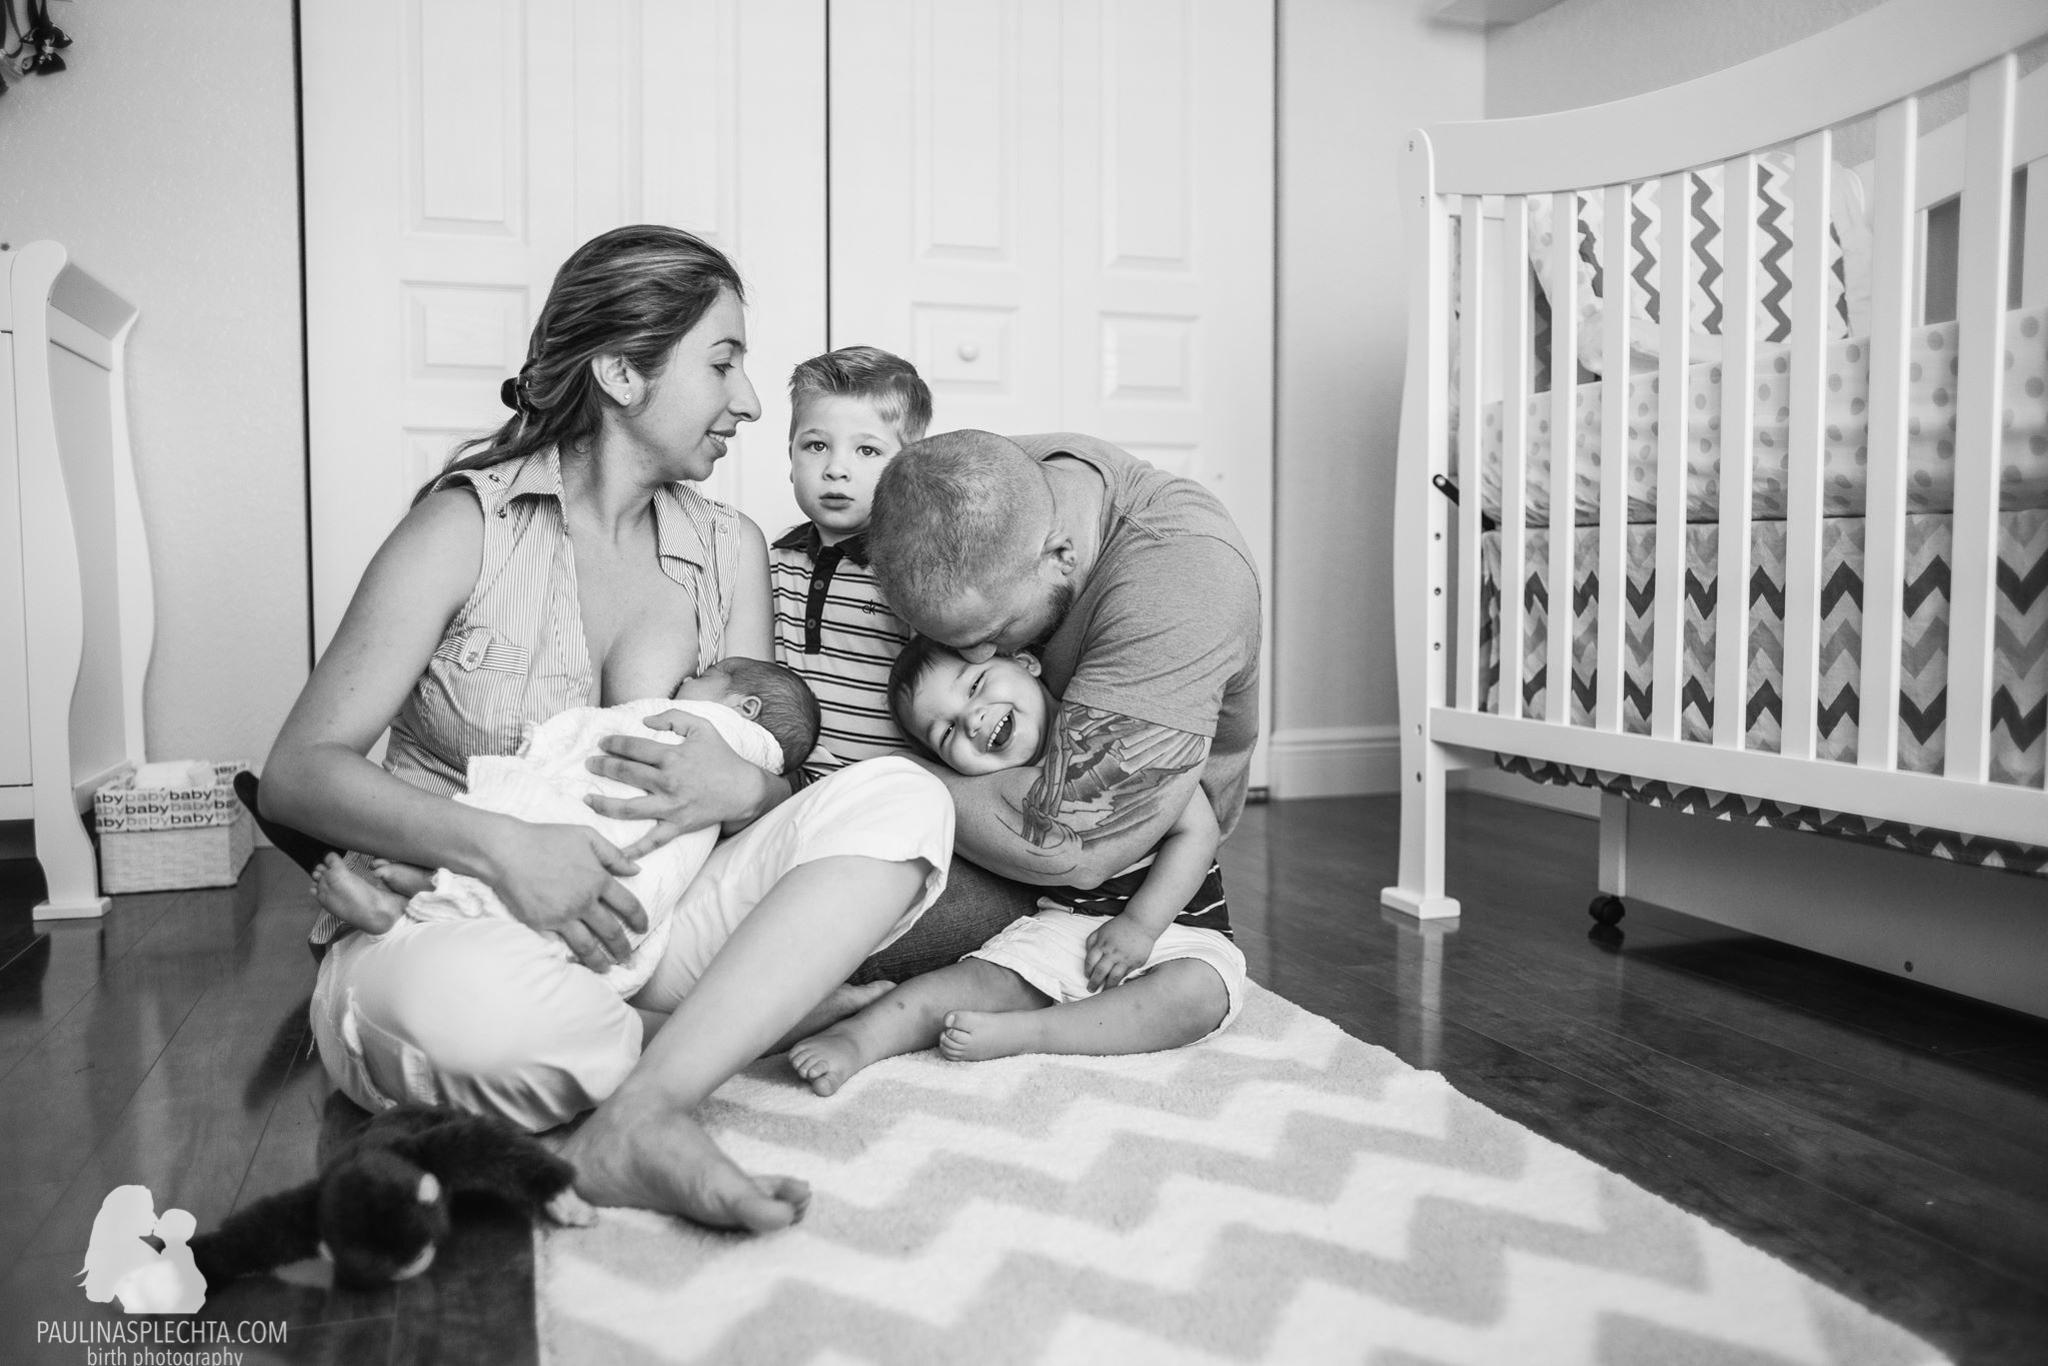 vbac-2vbac-birthwithoutfear-birthphotographer-midwife-womensmidwifery-christinehackshaw-kathyfair-10.jpg